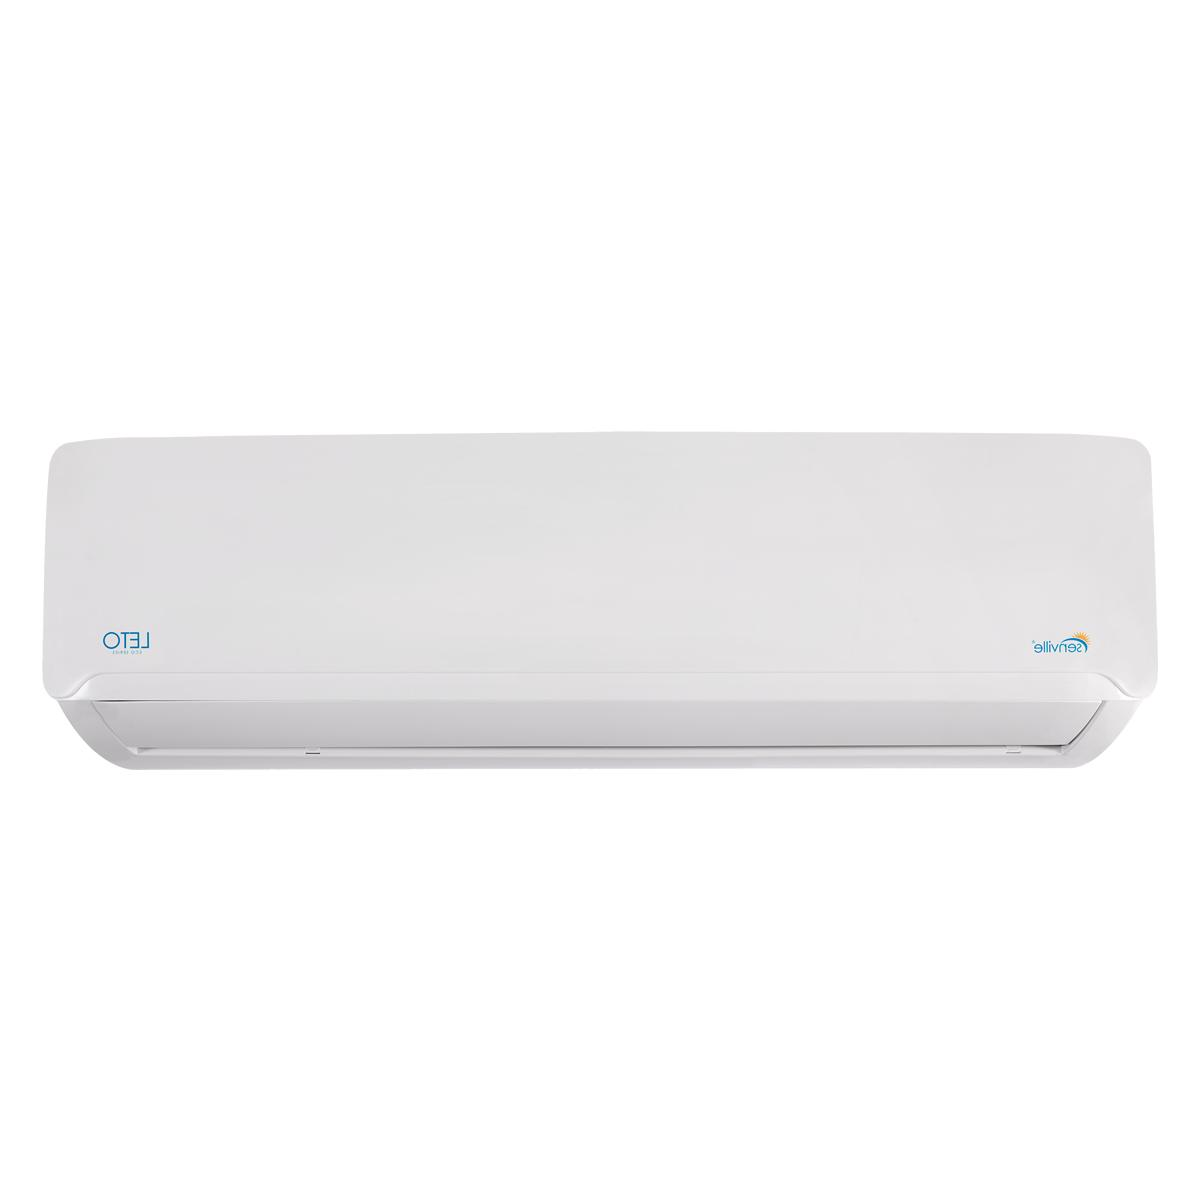 Mini Heat Air 1.5 TON